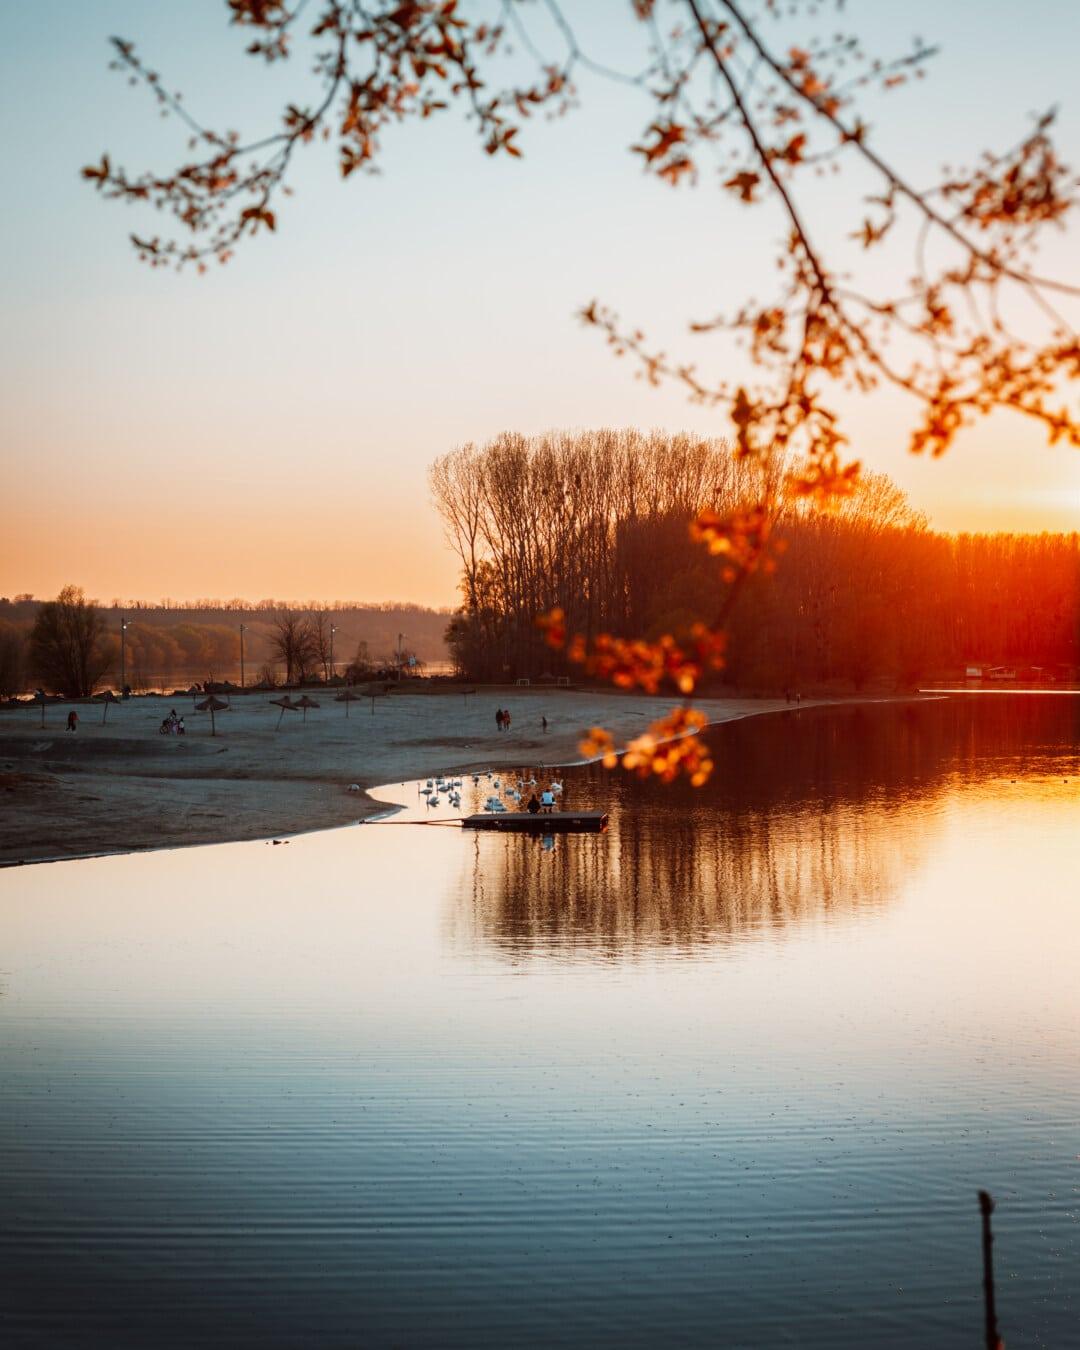 sunset, beach, lakeside, sun, dawn, water, lake, reflection, landscape, snow